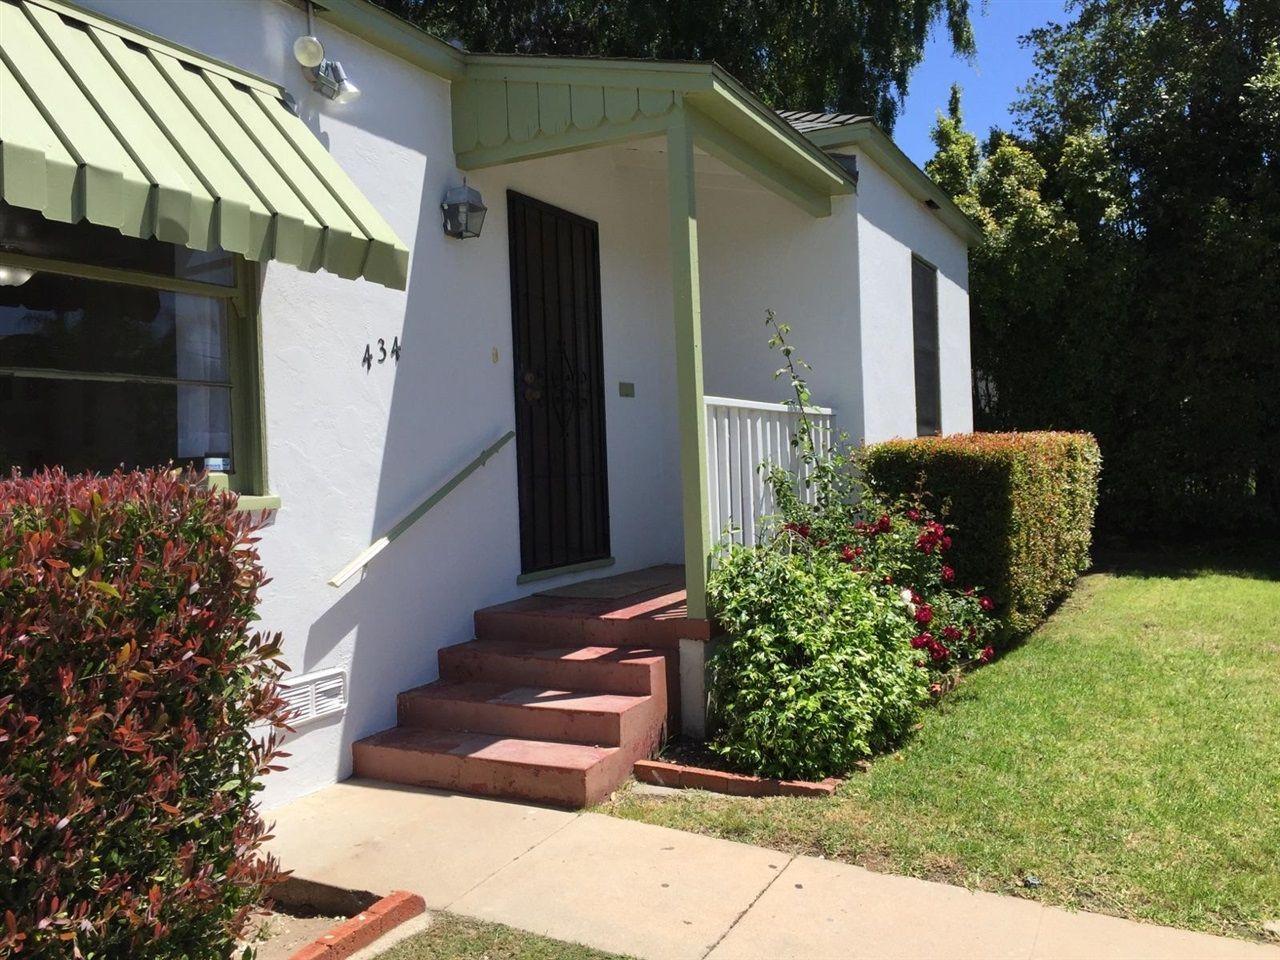 Main Photo: EAST ESCONDIDO House for sale : 3 bedrooms : 434 S Juniper in Escondido